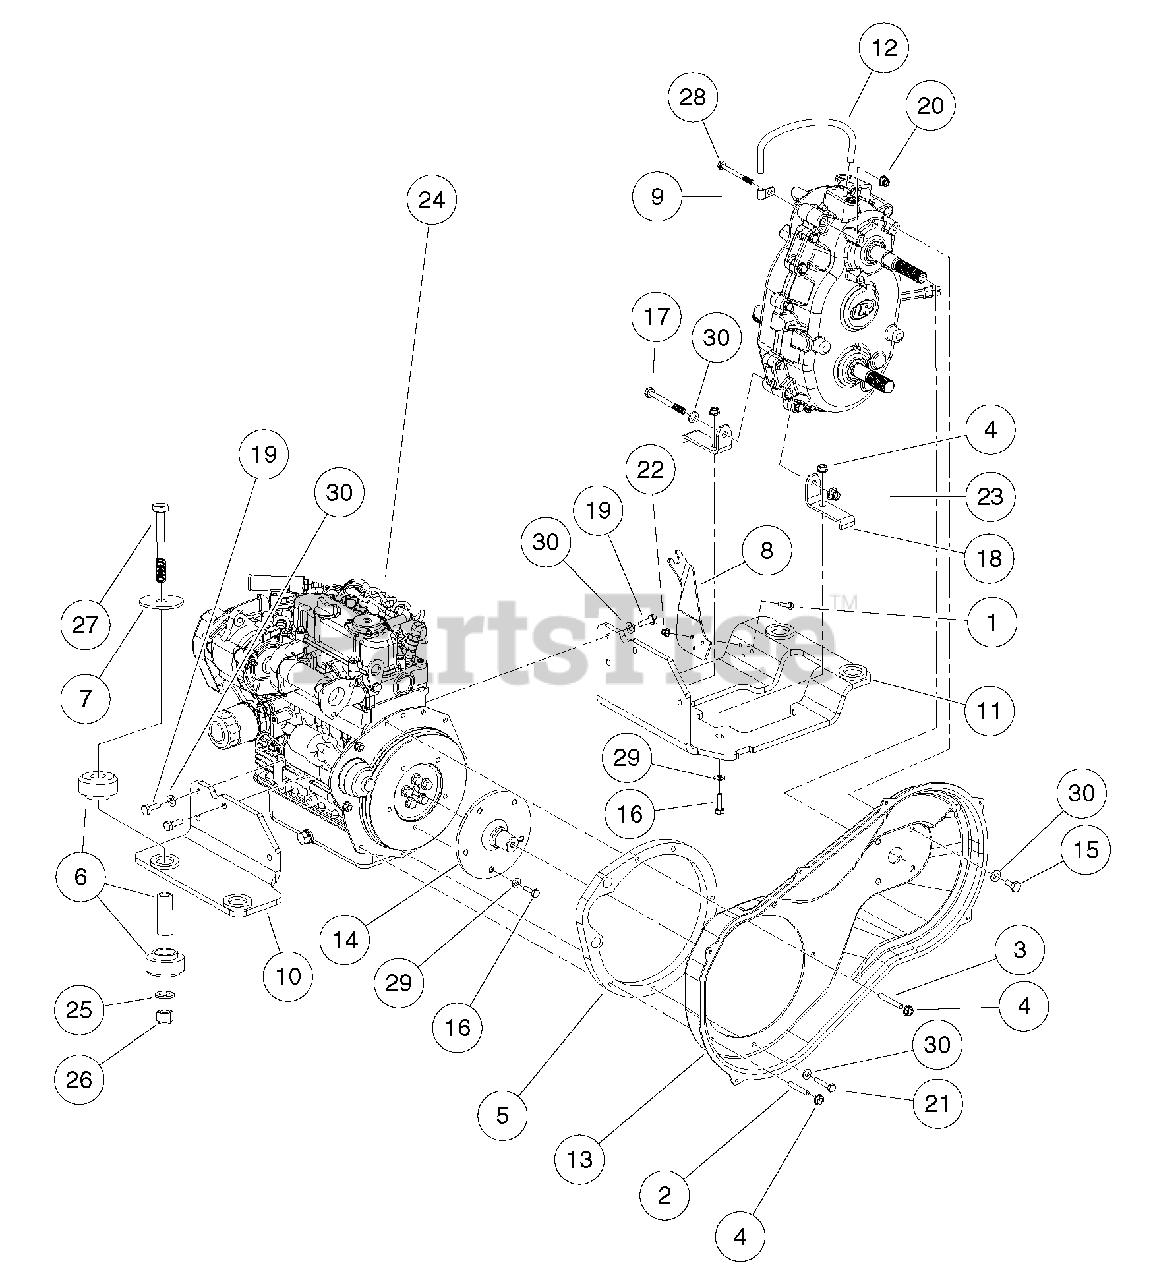 Husqvarna HUV 4421 GXL - Husqvarna 4x4 Utility Vehicle (2009 ... on kubota front axle diagram, kubota g1800 parts diagram, kubota d1105 engine breakdown, kubota fuel system diagram, kubota t1700x parts diagram, kubota b7000 parts diagram, kubota v2203 parts breakdown, kubota d1105 parts diagrams, kubota b1700 parts diagram, kubota d902 parts diagram, kubota d722 parts diagram, kubota t1770 parts diagram, kohler diagrams, kubota lawn mower carburetor diagram, kubota bx parts diagrams, kubota b20 hydraulic pump, briggs & stratton engine parts diagrams, kubota parts diagrams online, onan engine parts diagrams, kubota zero turn parts diagrams,